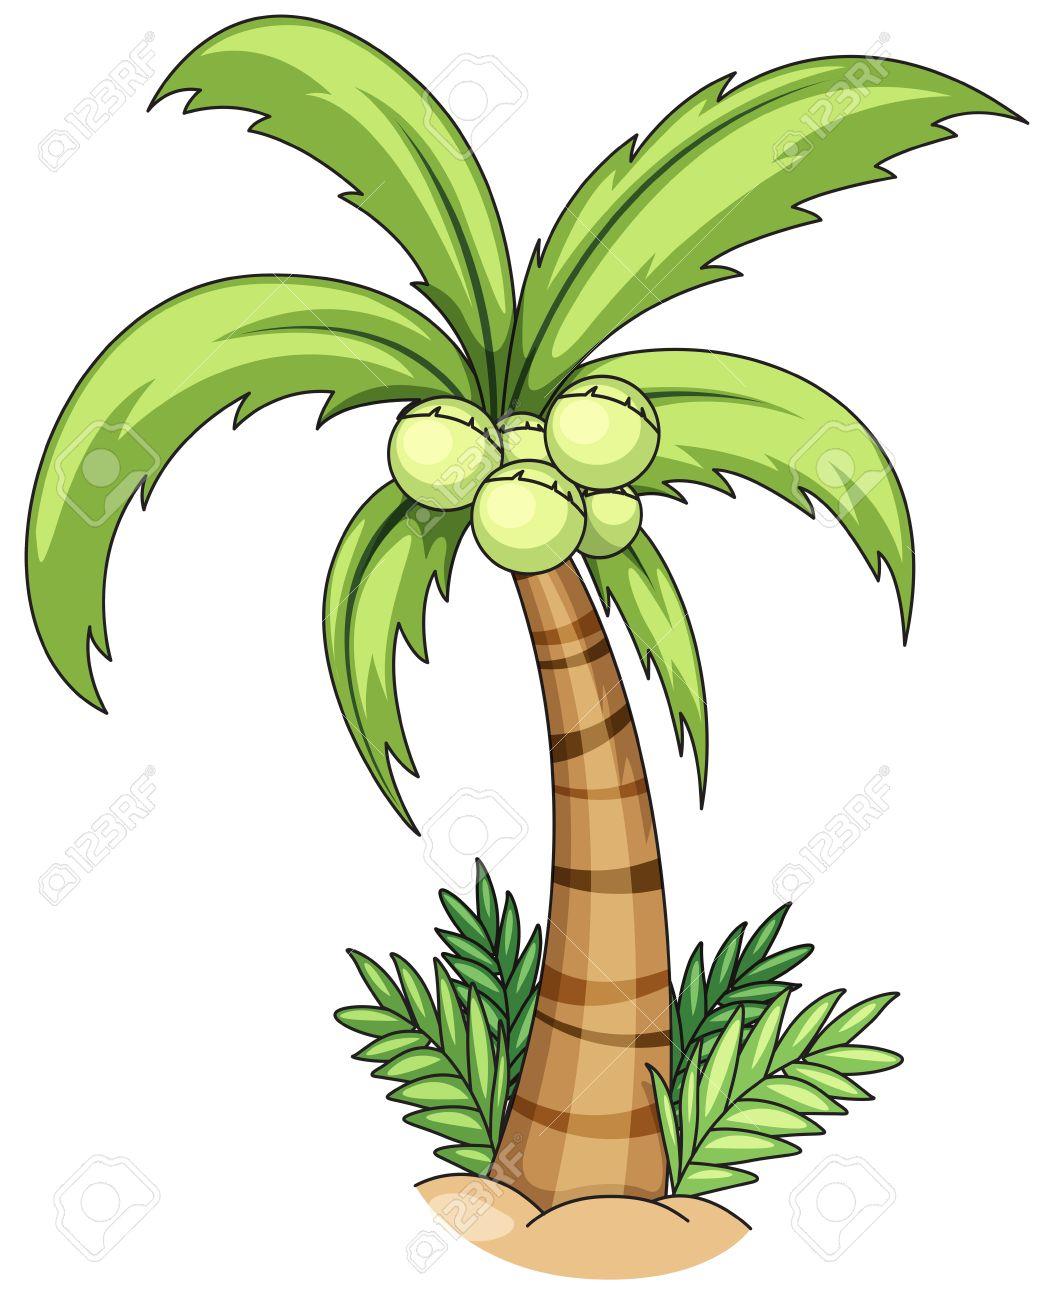 Closeup single coconut tree with coconuts.